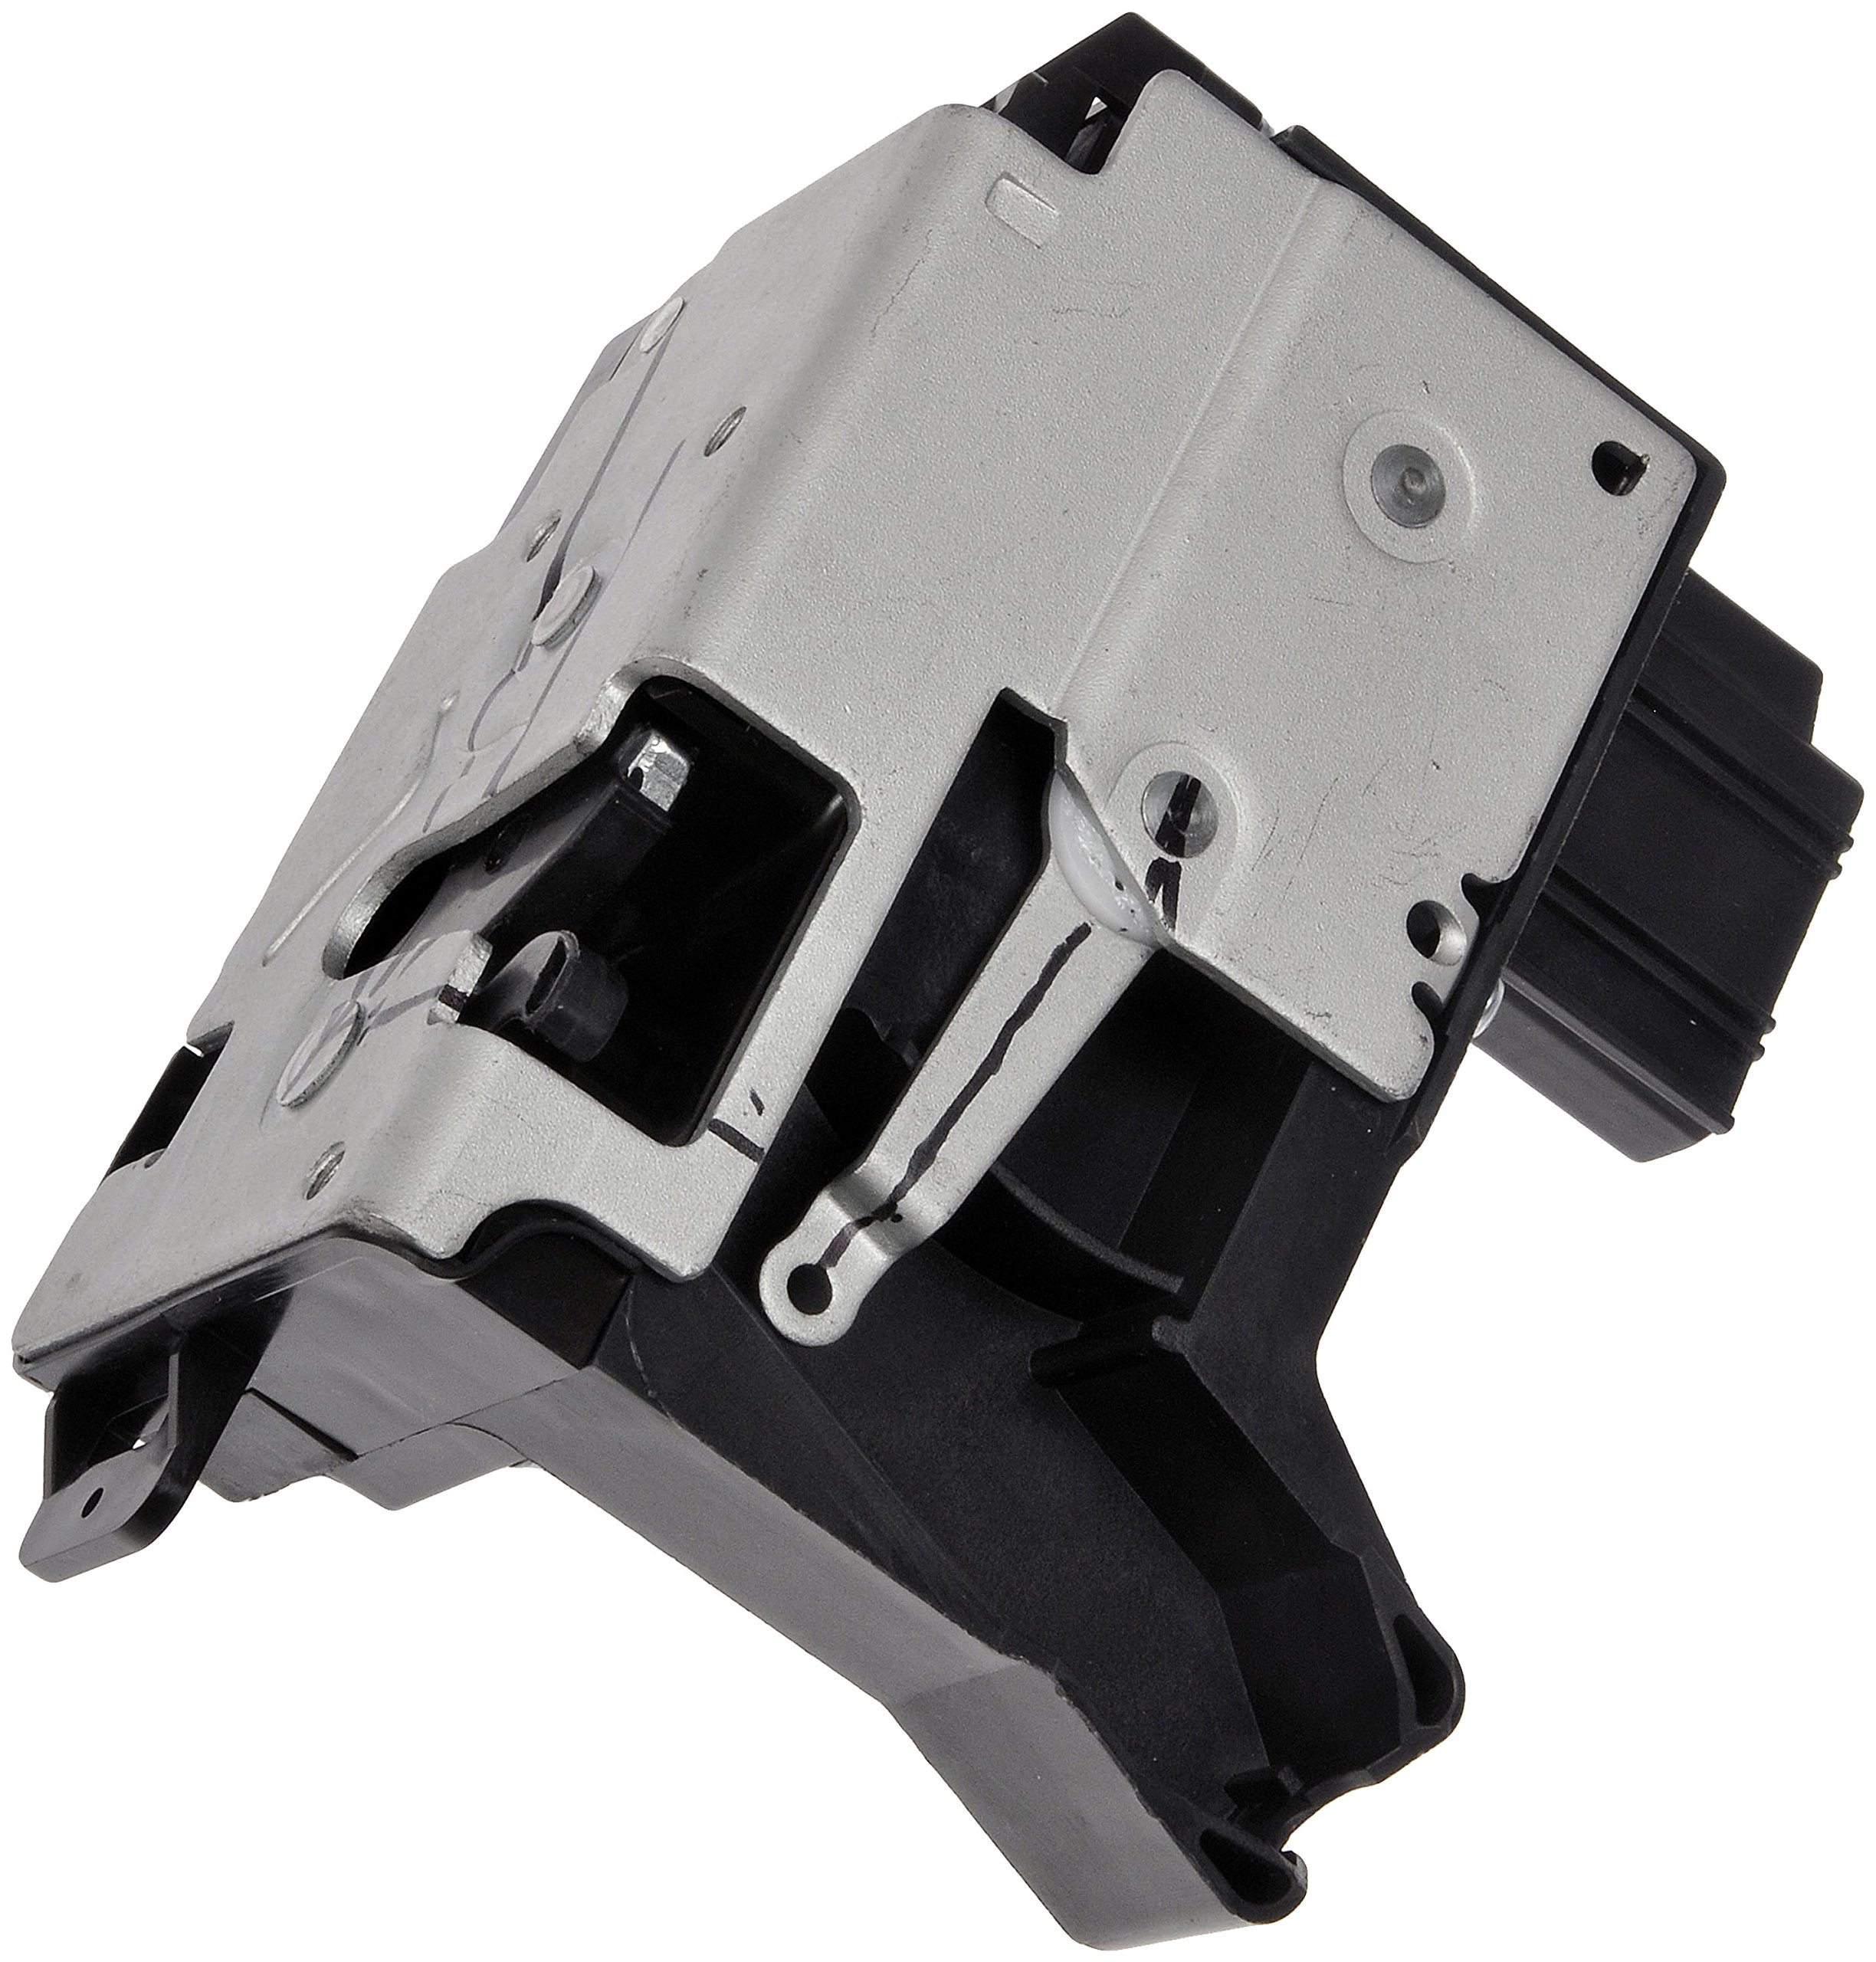 Replaces 6L8Z-7821813-B, 6L8Z7821813B, 2L8Z78219A65BAA, 2L8Z78219A65BAB APDTY 048755 Door Latch Lock Actuator Motor Fits Front Left 2005-2007 Ford Escape or Mercury Mariner w//Power Door Locks